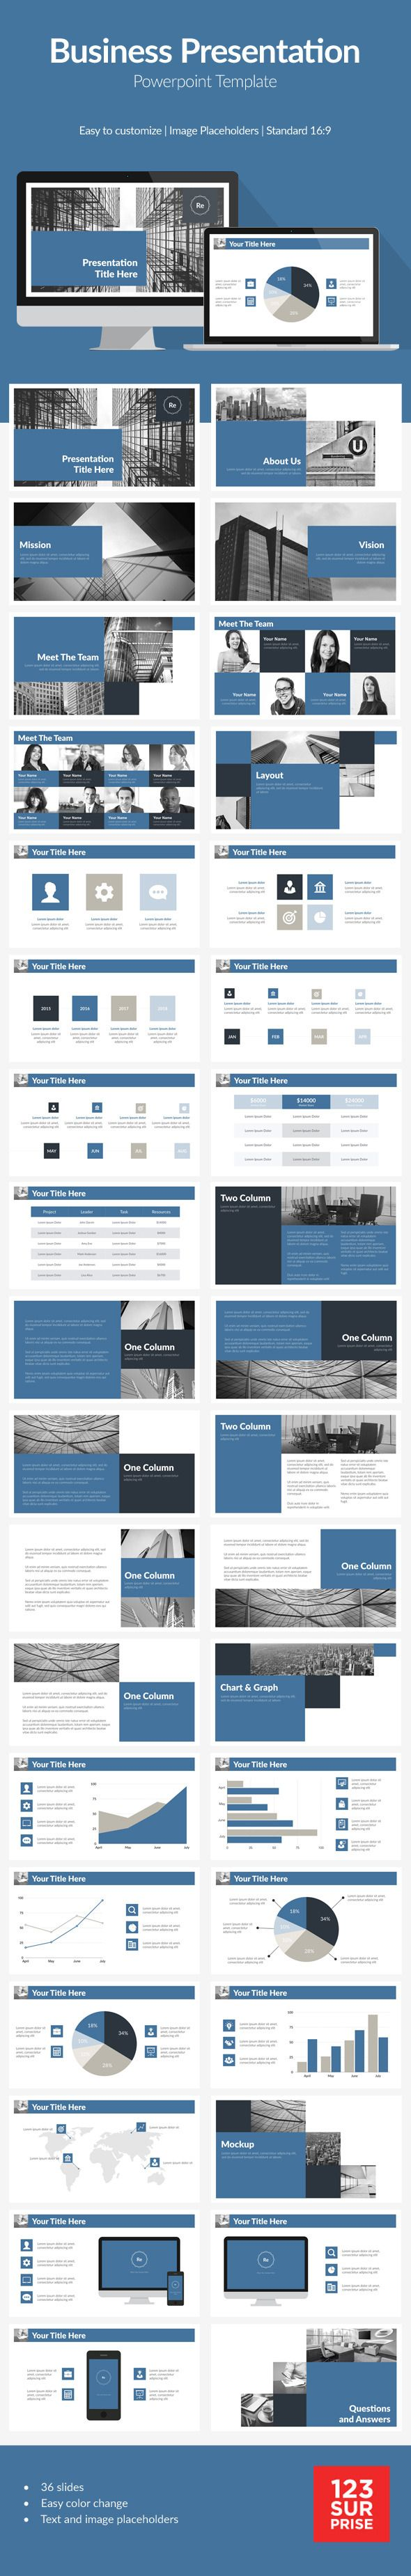 Blue Corporate Business Powerpoint Design Tempalte #slides Download: http://graphicriver.net/item/blue-corporate-business-powerpoint-template/12929686?ref=ksioks